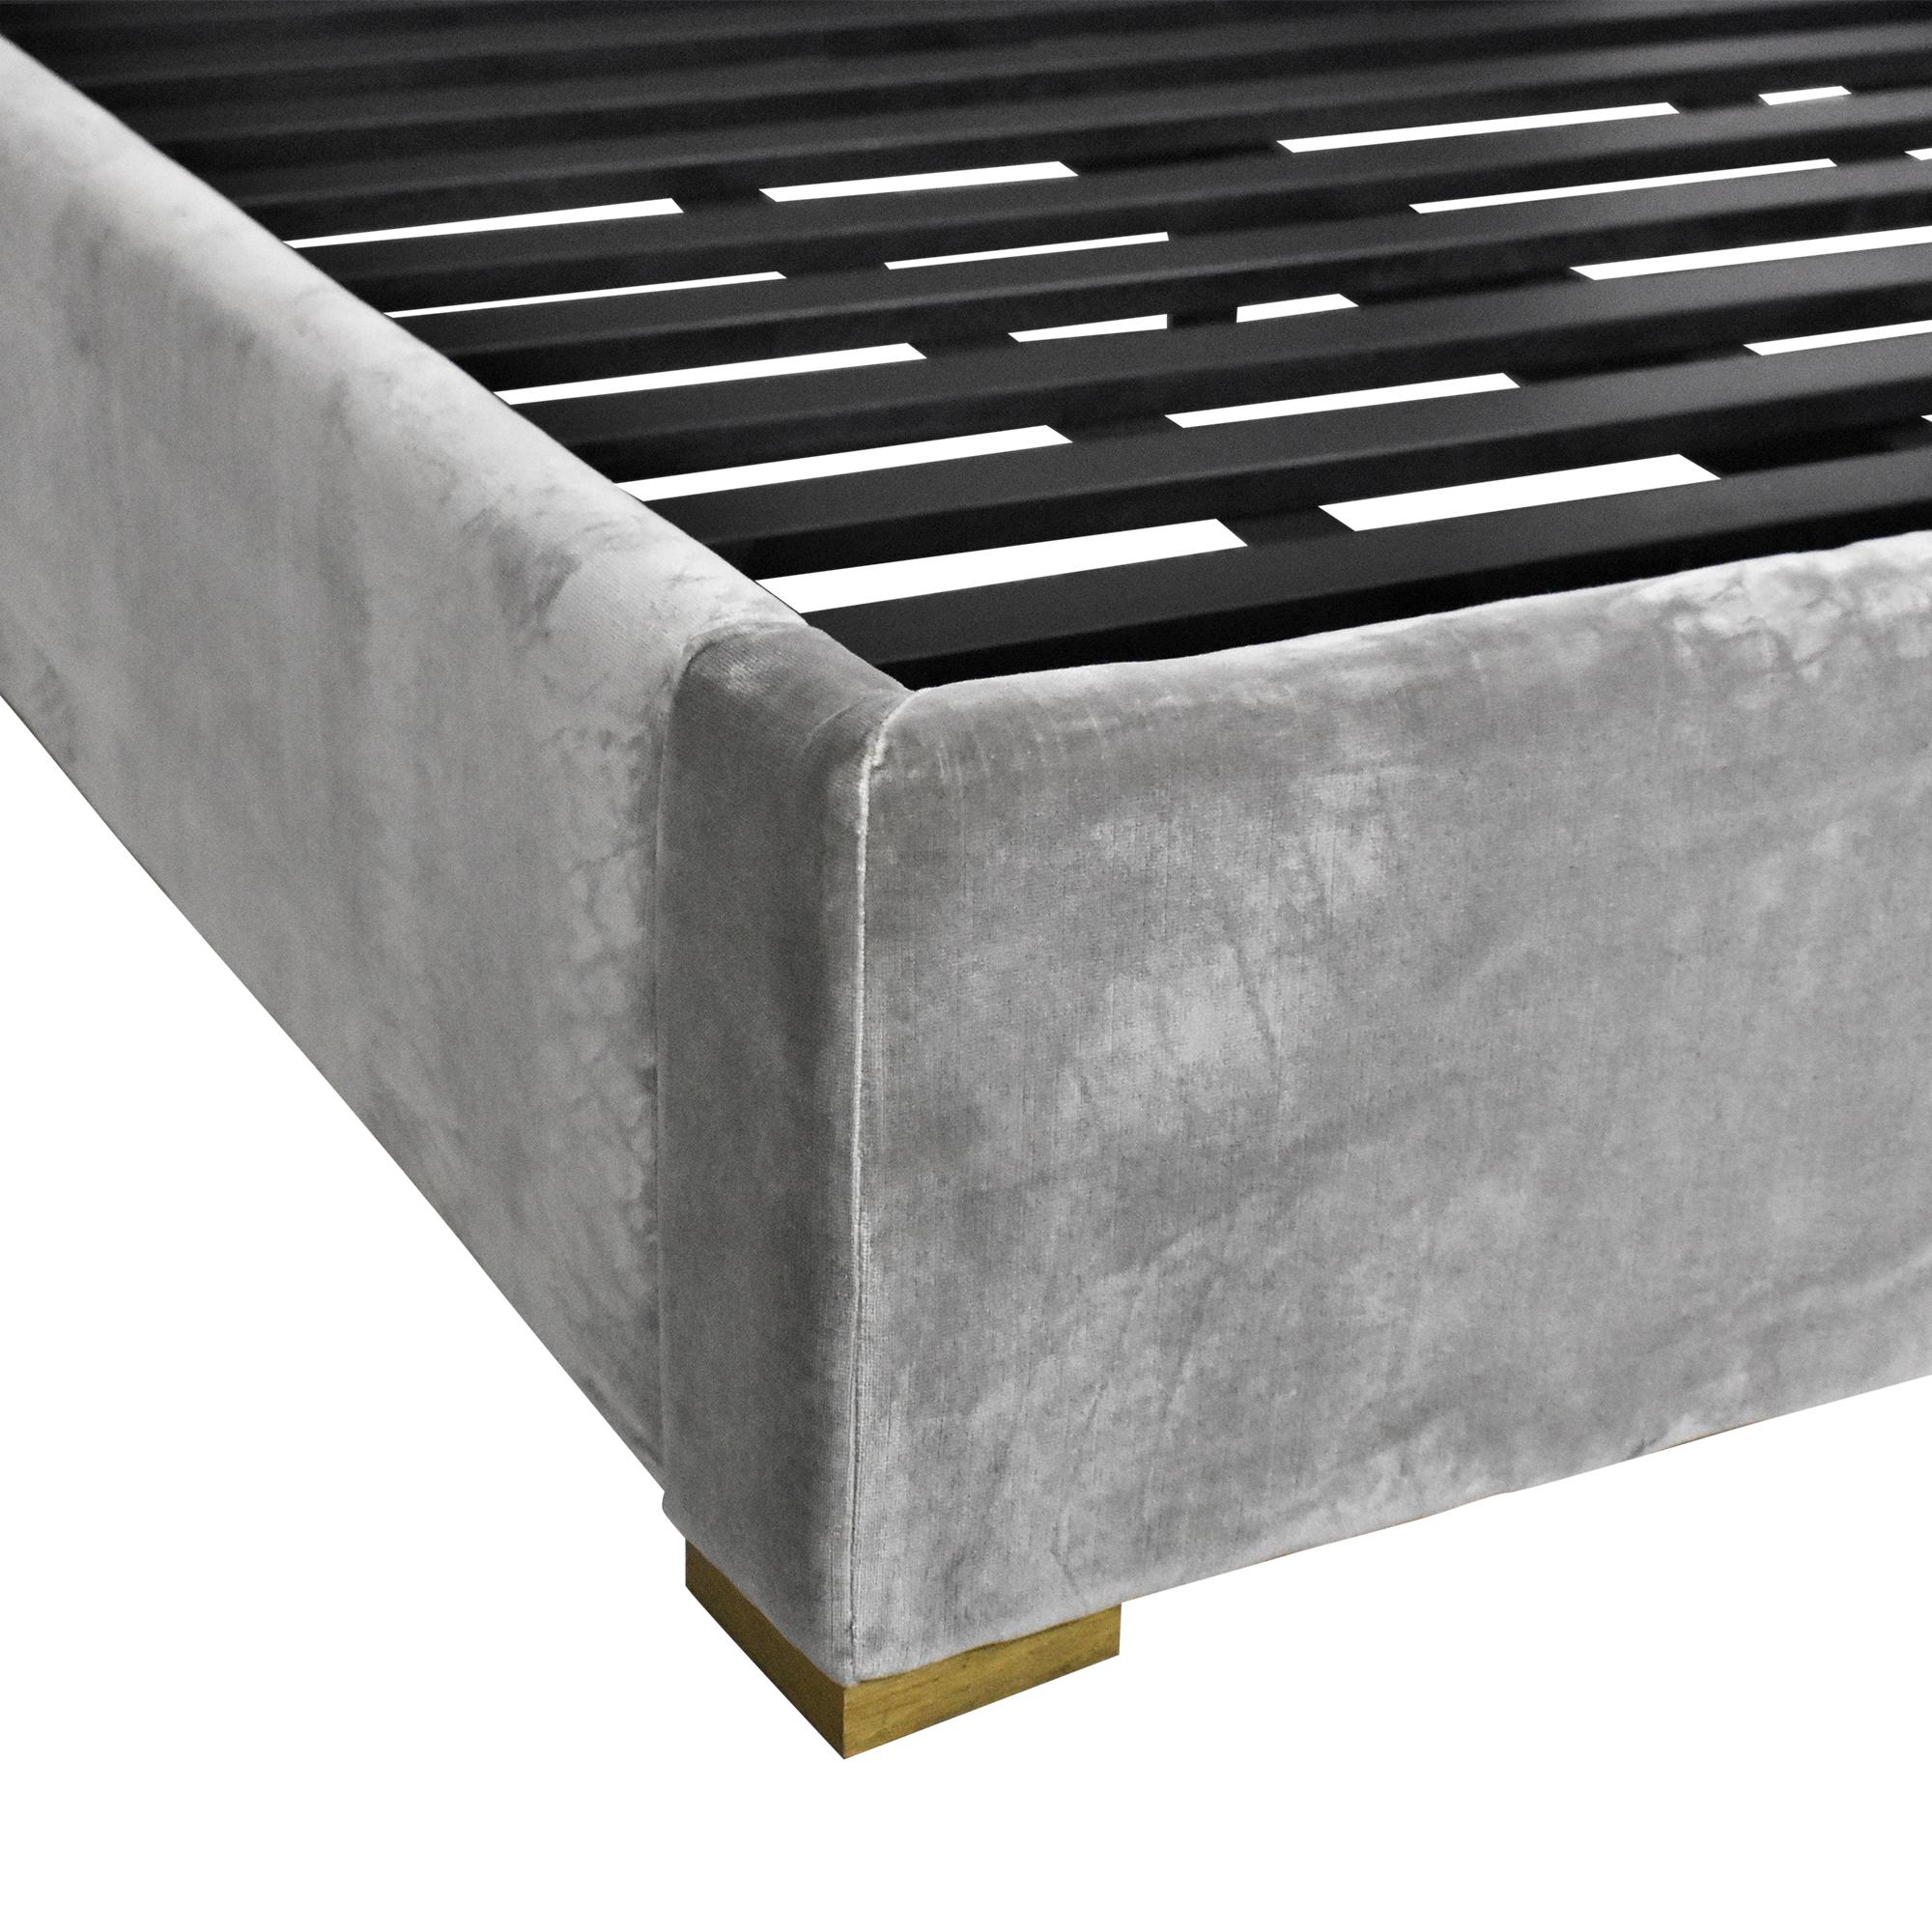 Restoration Hardware Landis Quilted Full Bed / Beds